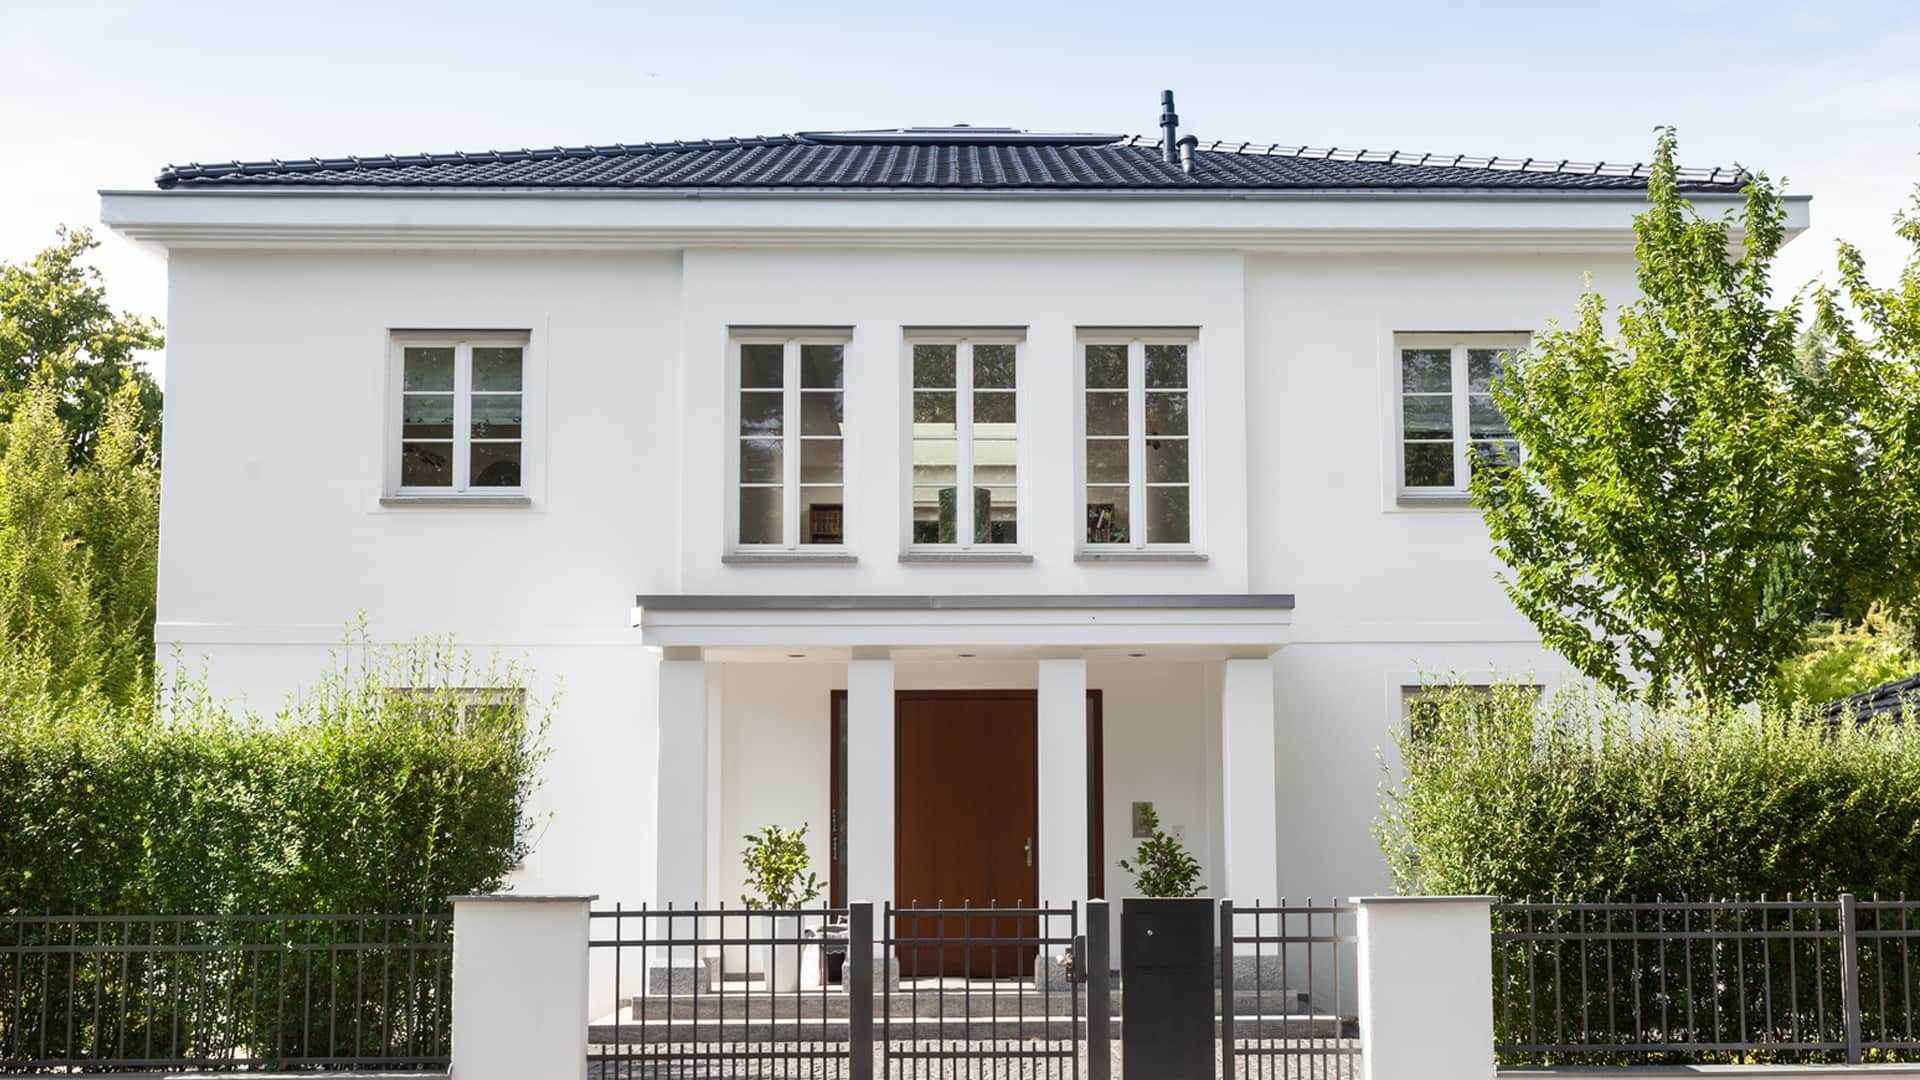 haus bauen landhausstil wohn design. Black Bedroom Furniture Sets. Home Design Ideas